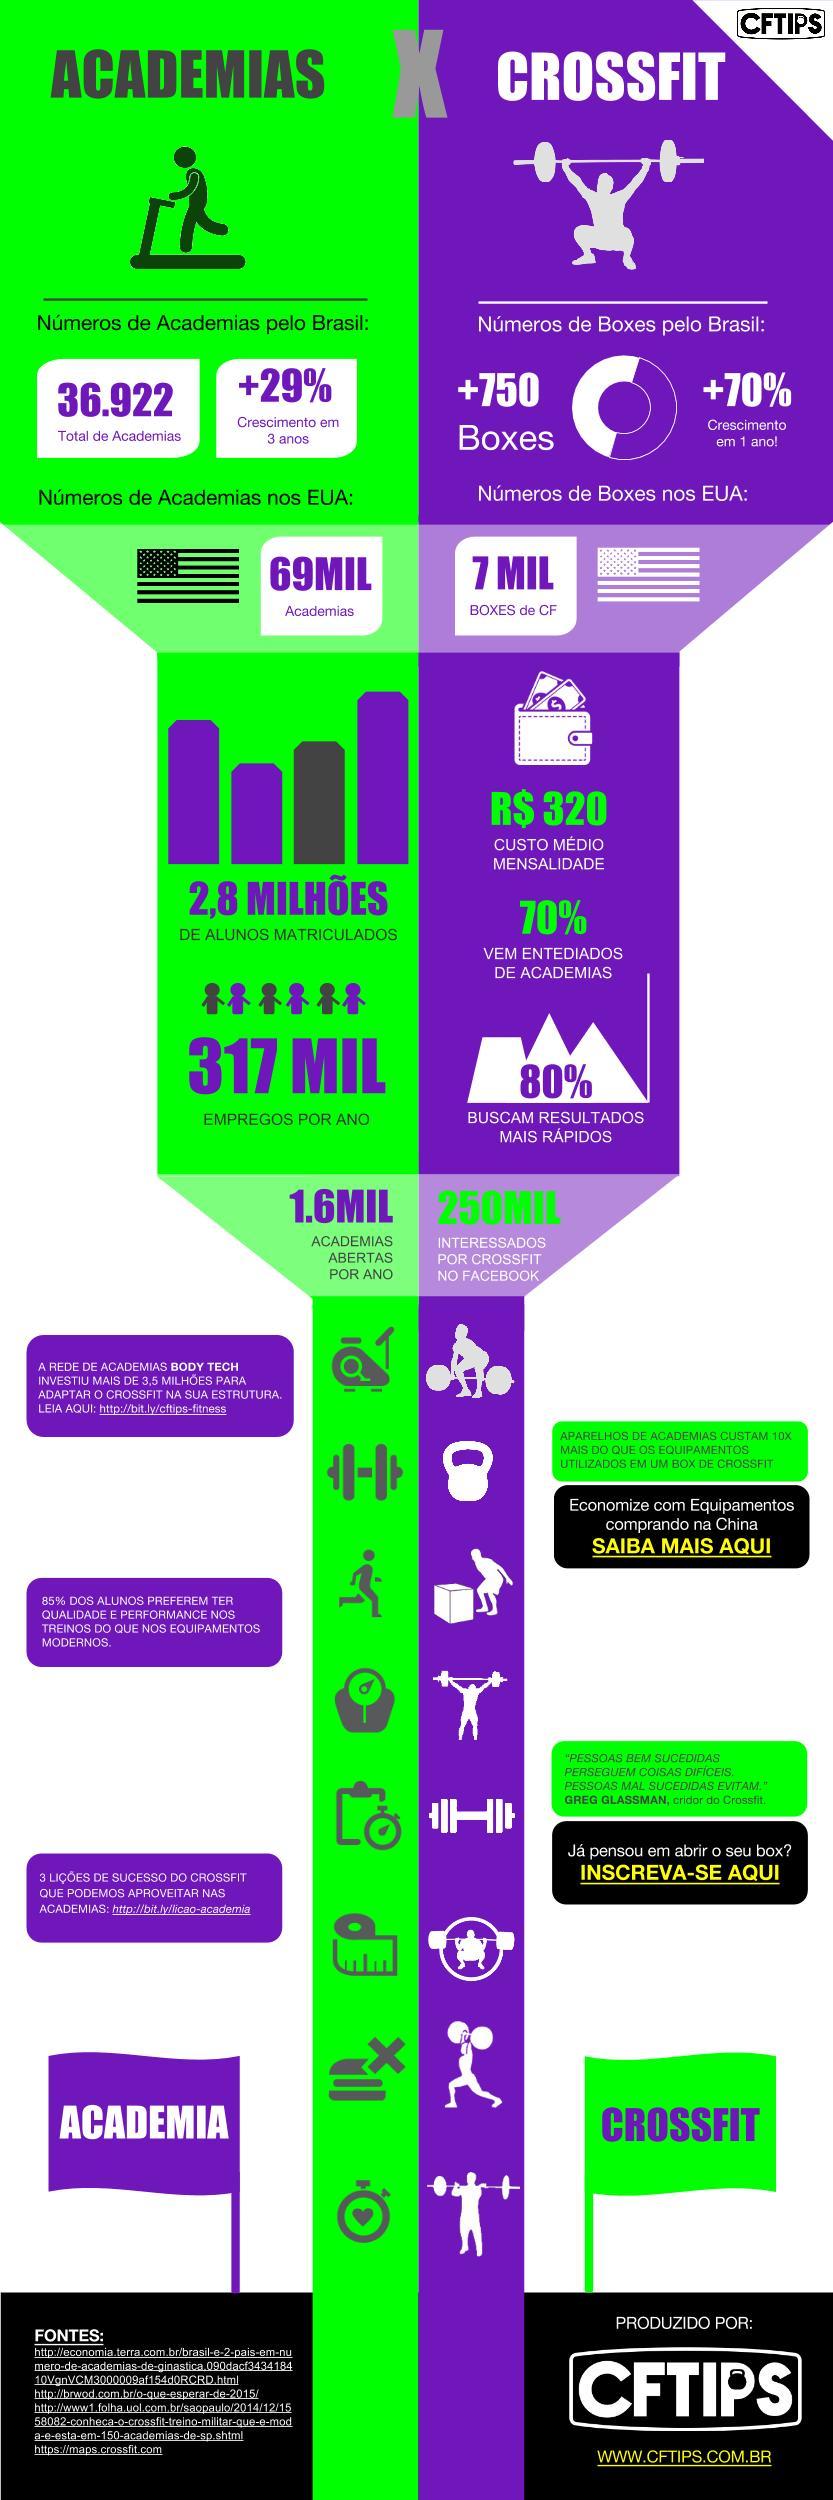 CFTIPS Crossfit Academia infografico